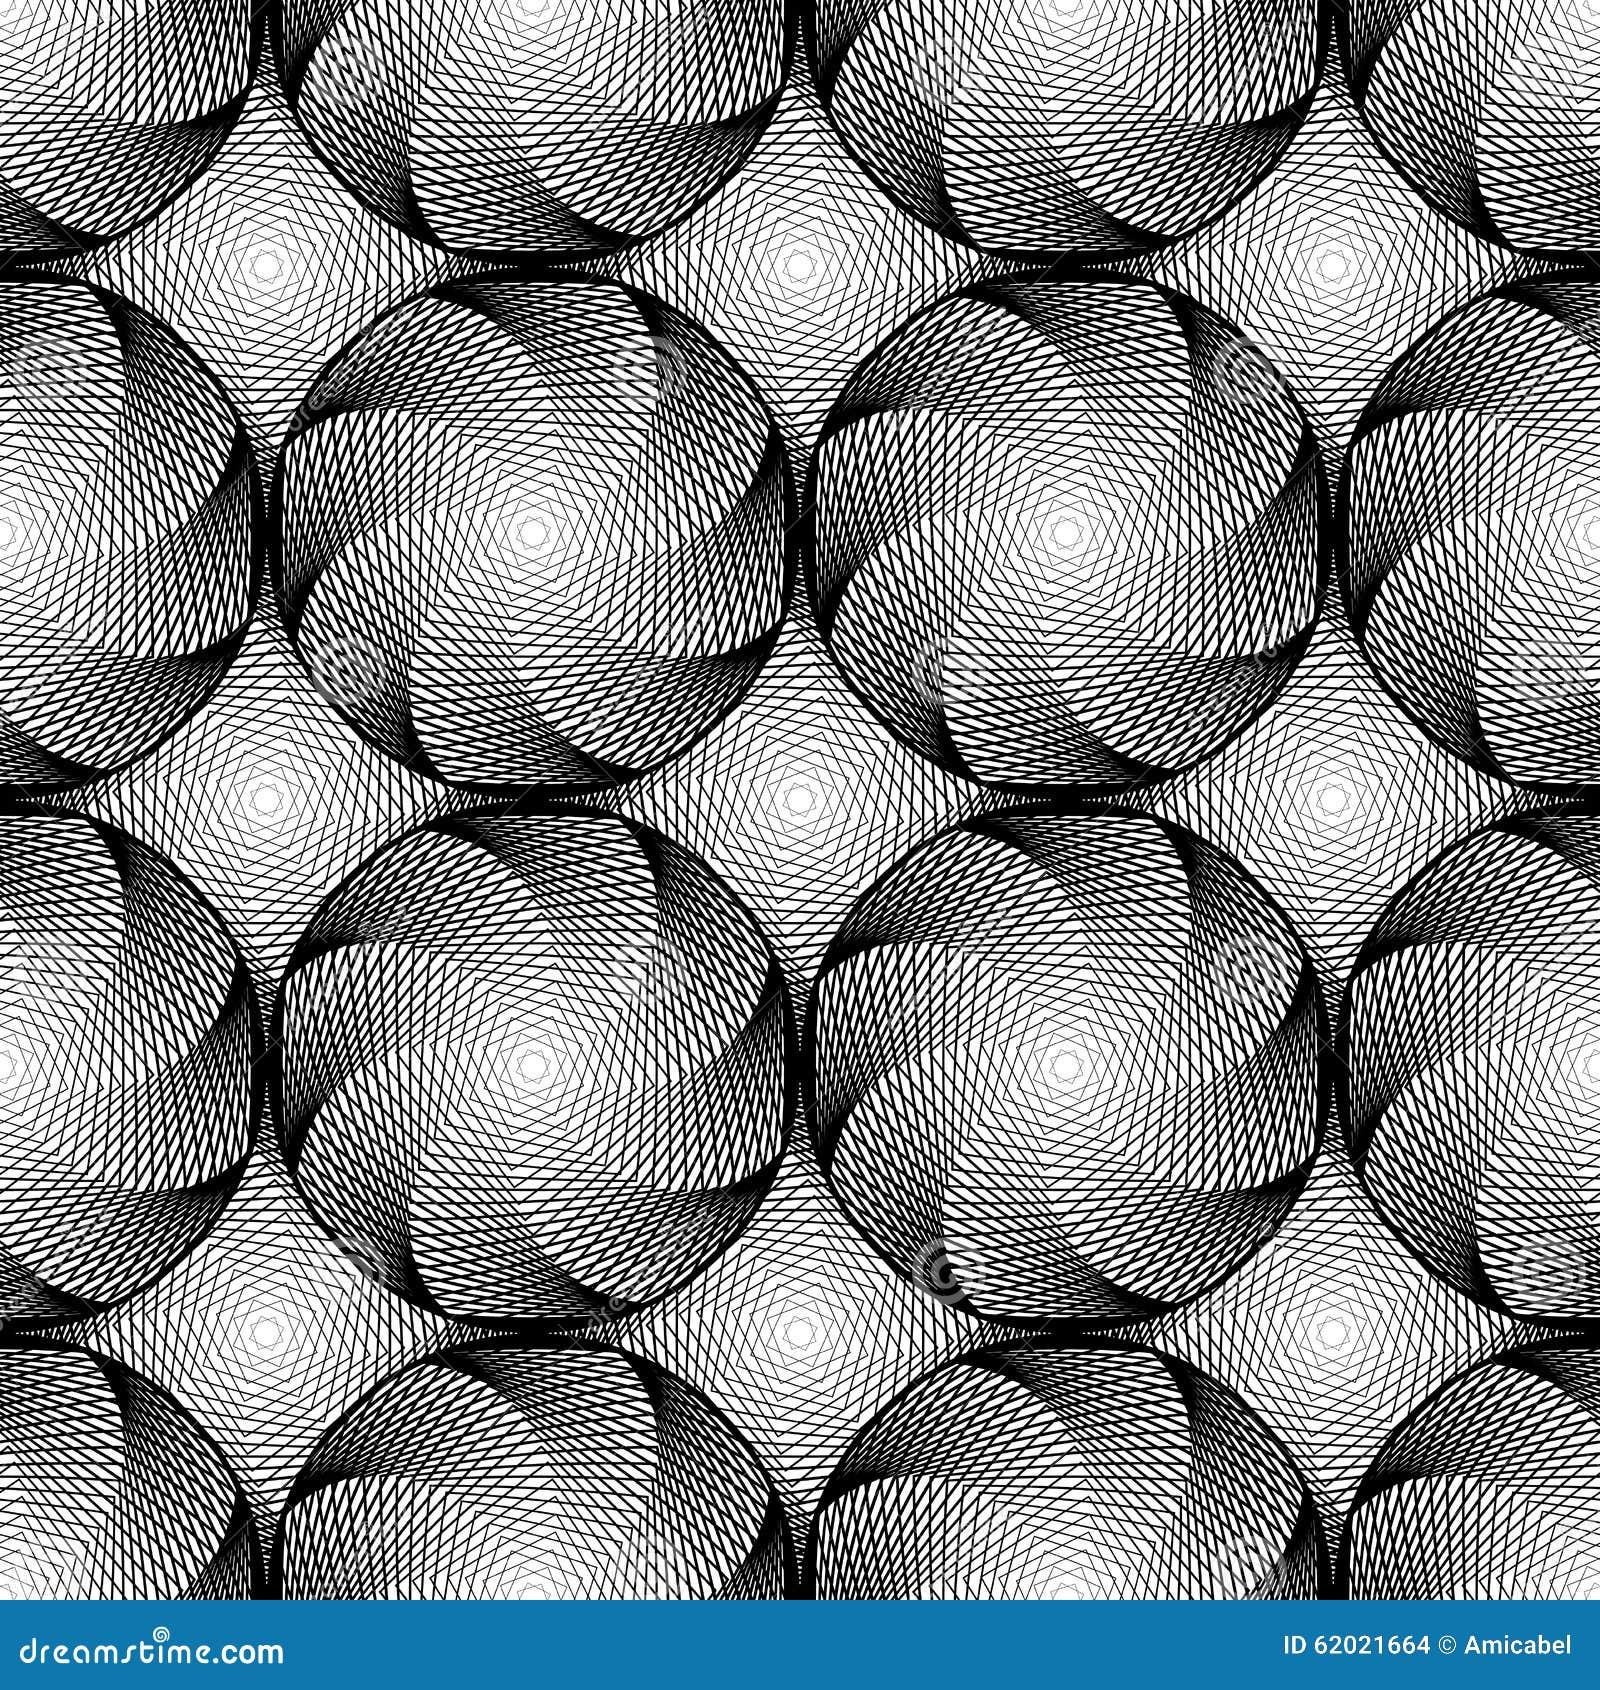 Design Seamless Monochrome Circular Pattern Stock Vector